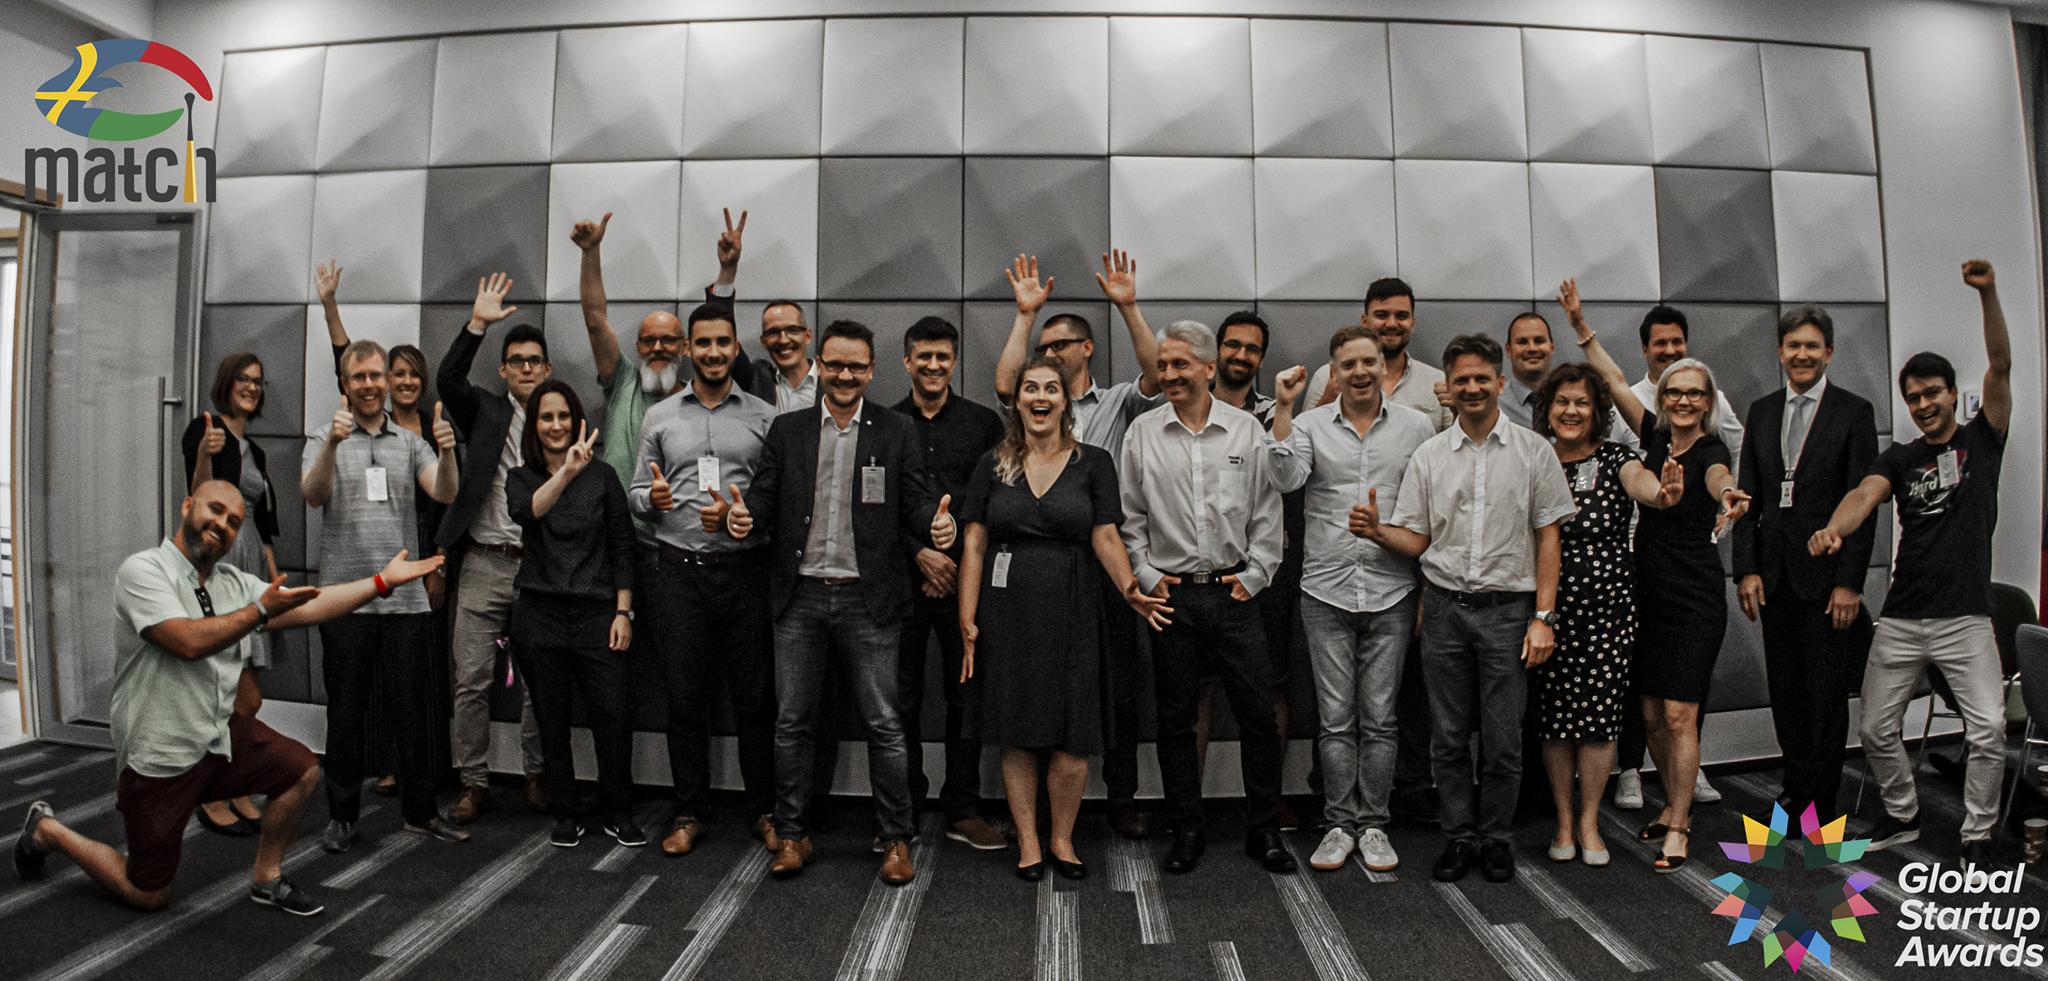 Aeriu got invitation to MATCH Startup Program